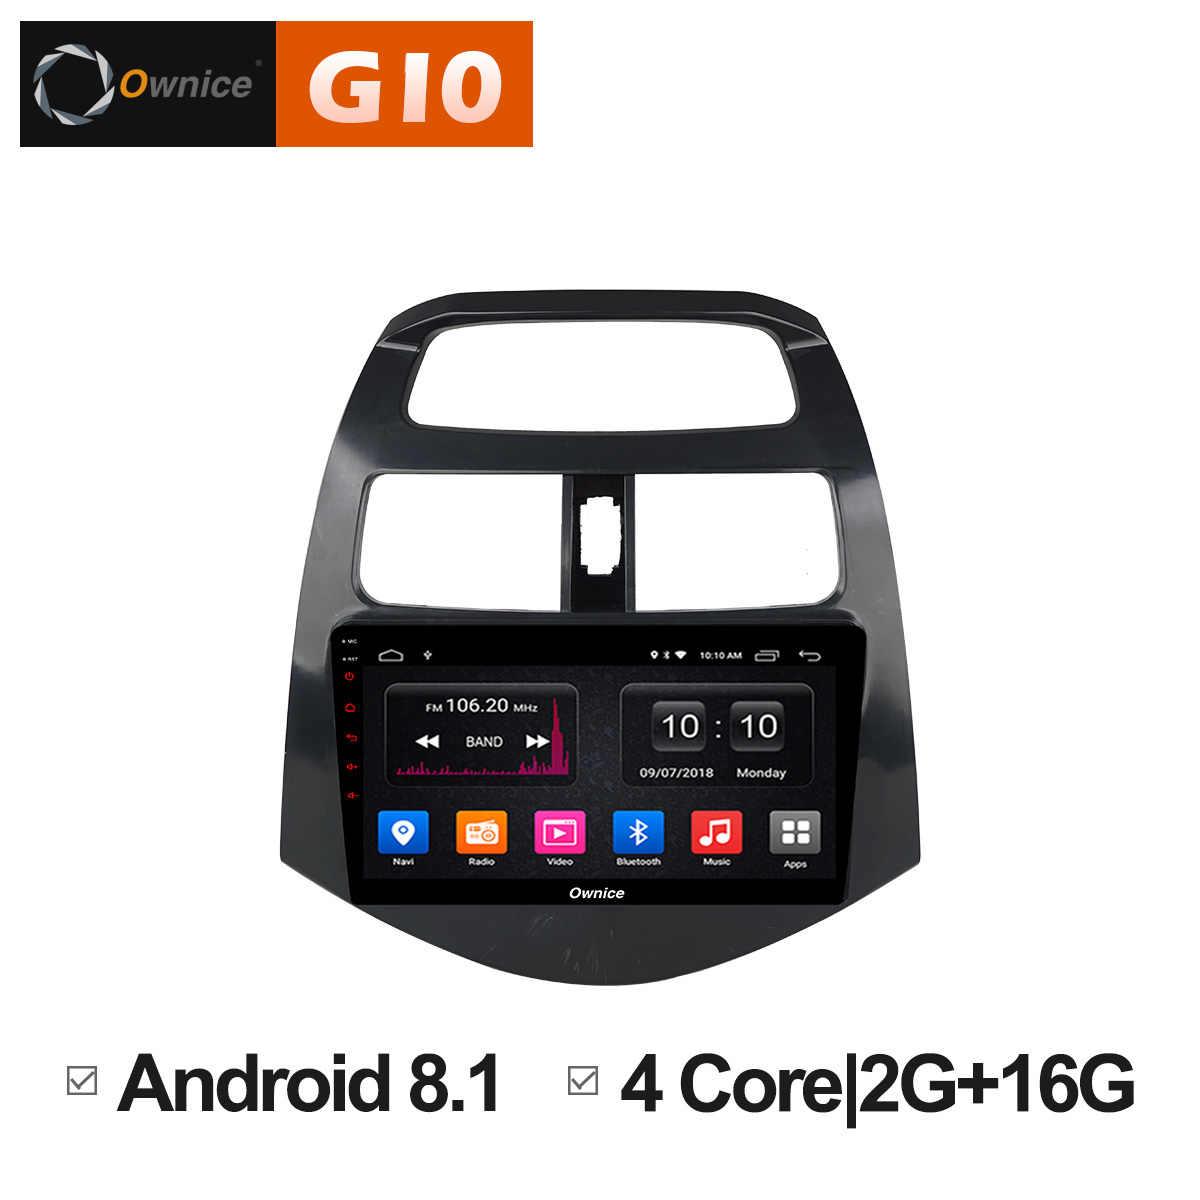 Ownice C500 + G10 Auto DVD GPS Navigatie Speler Auto Stereo Voor CHEVROLET Spark Beat 2010 2011 2012-2014 radio Autoradio Apparaat